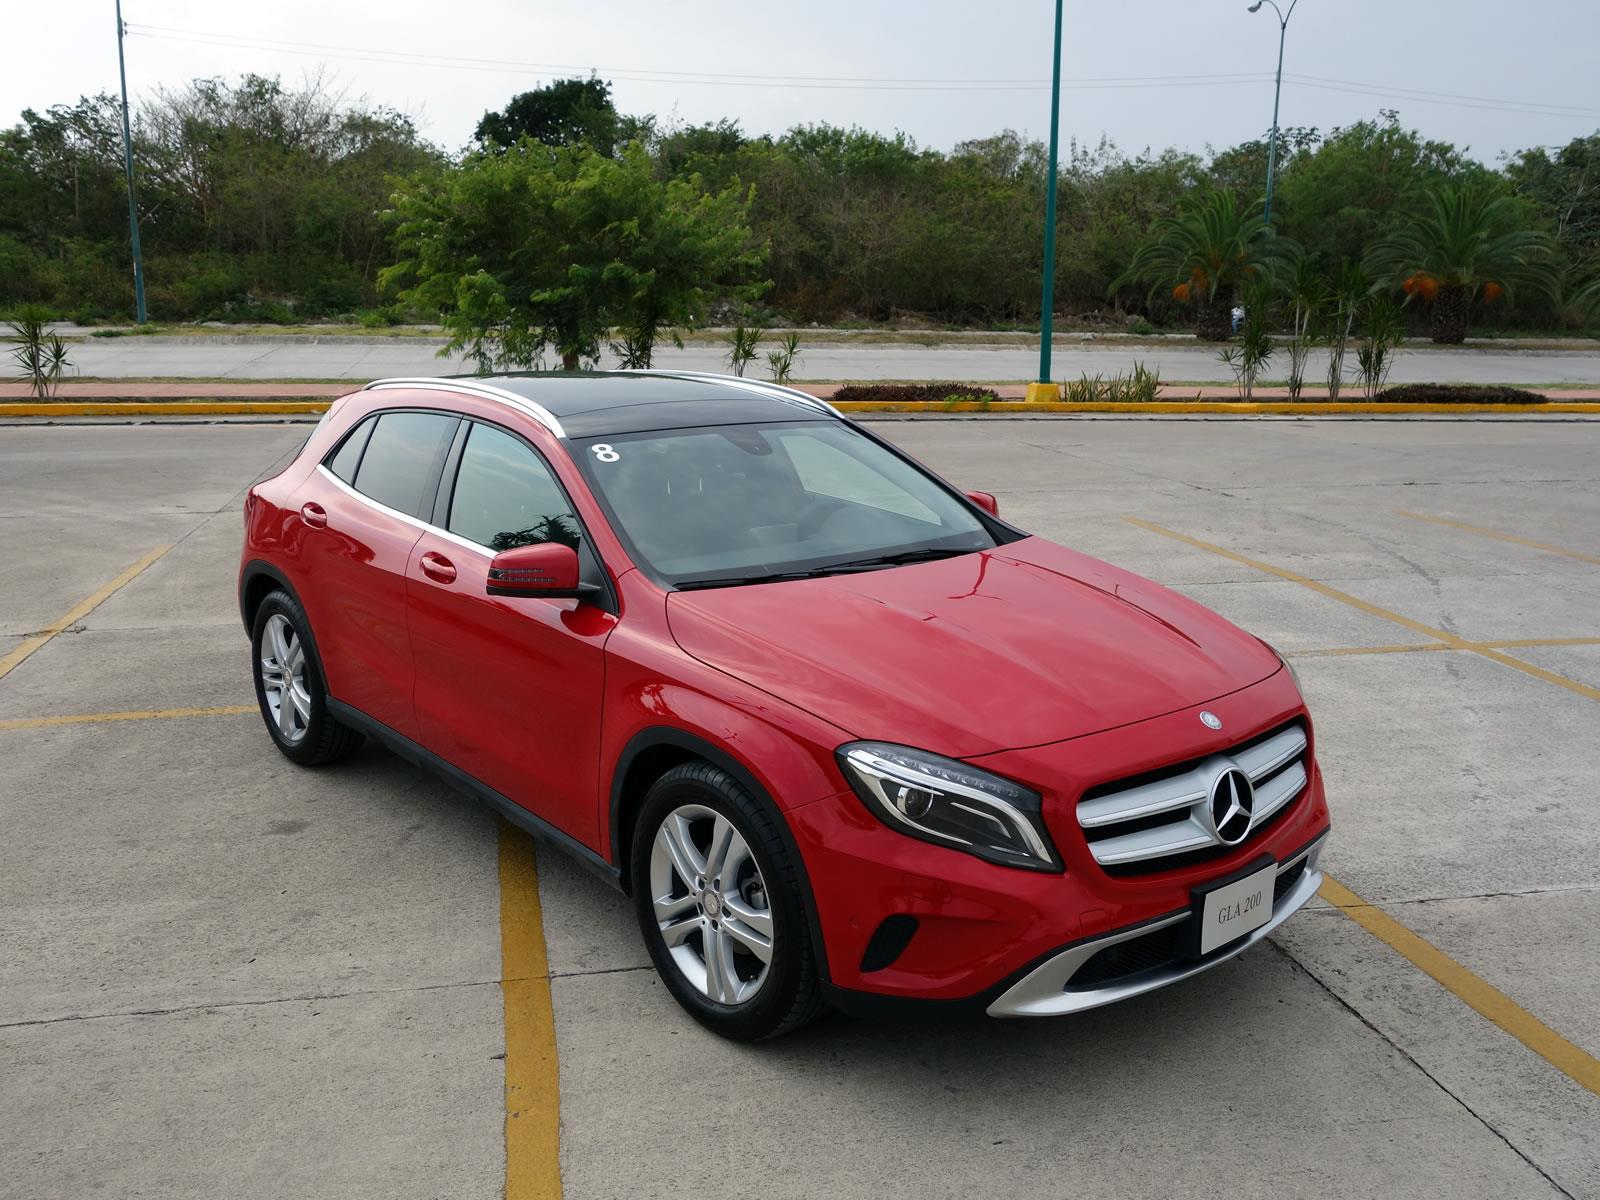 Mercedes benz gla 2015 llega a m xico desde 459 900 pesos for Mercedes benz com mx mexico